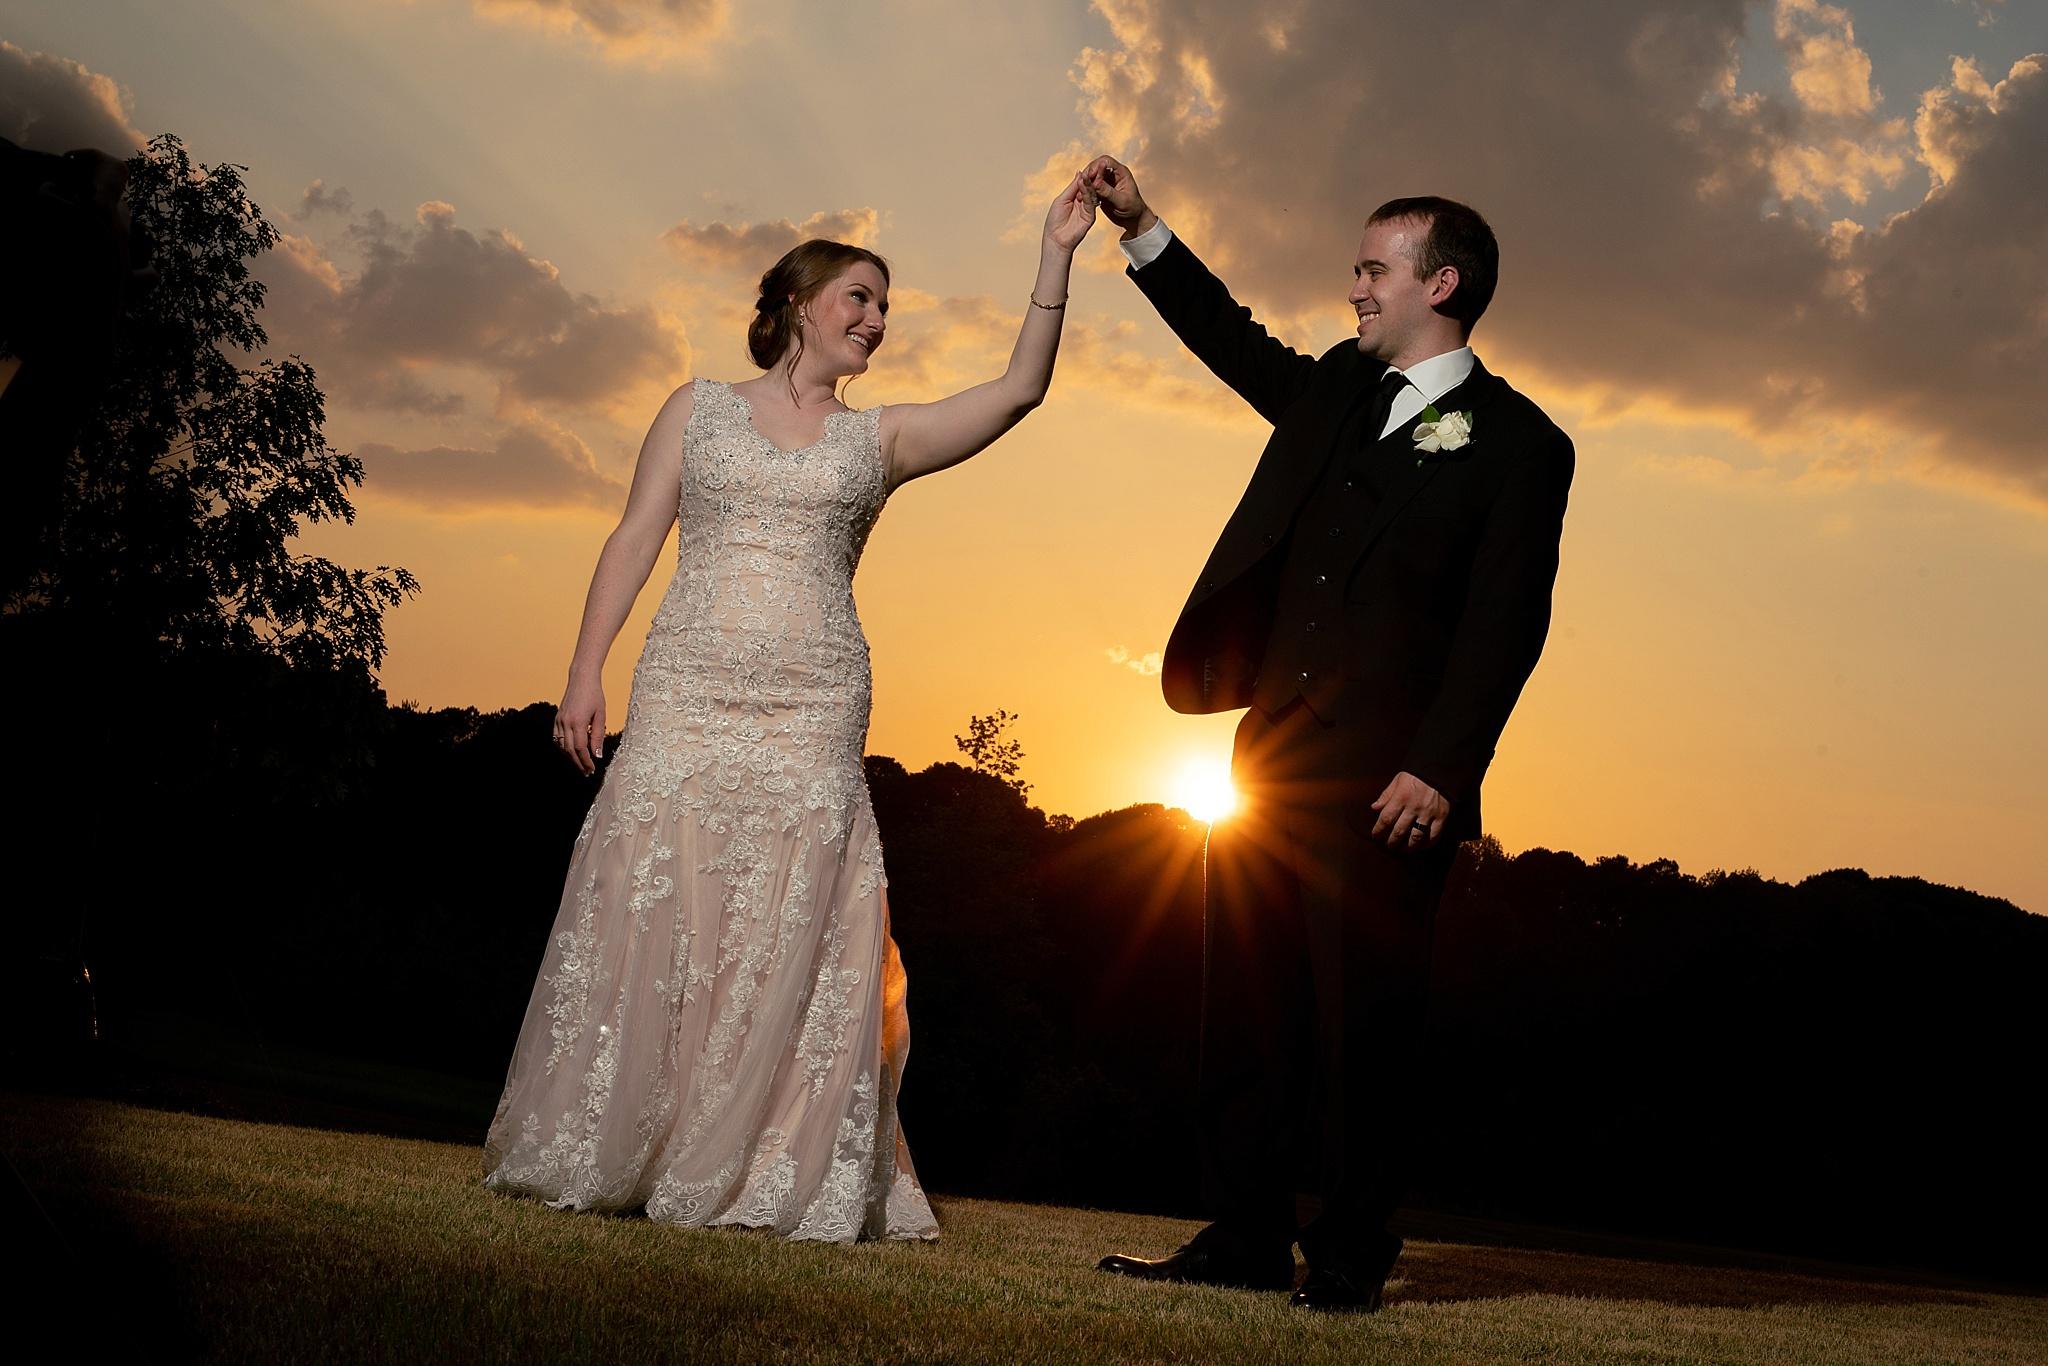 Pavilion-Carriage-Farms-Wedding-Photographer-227.jpg